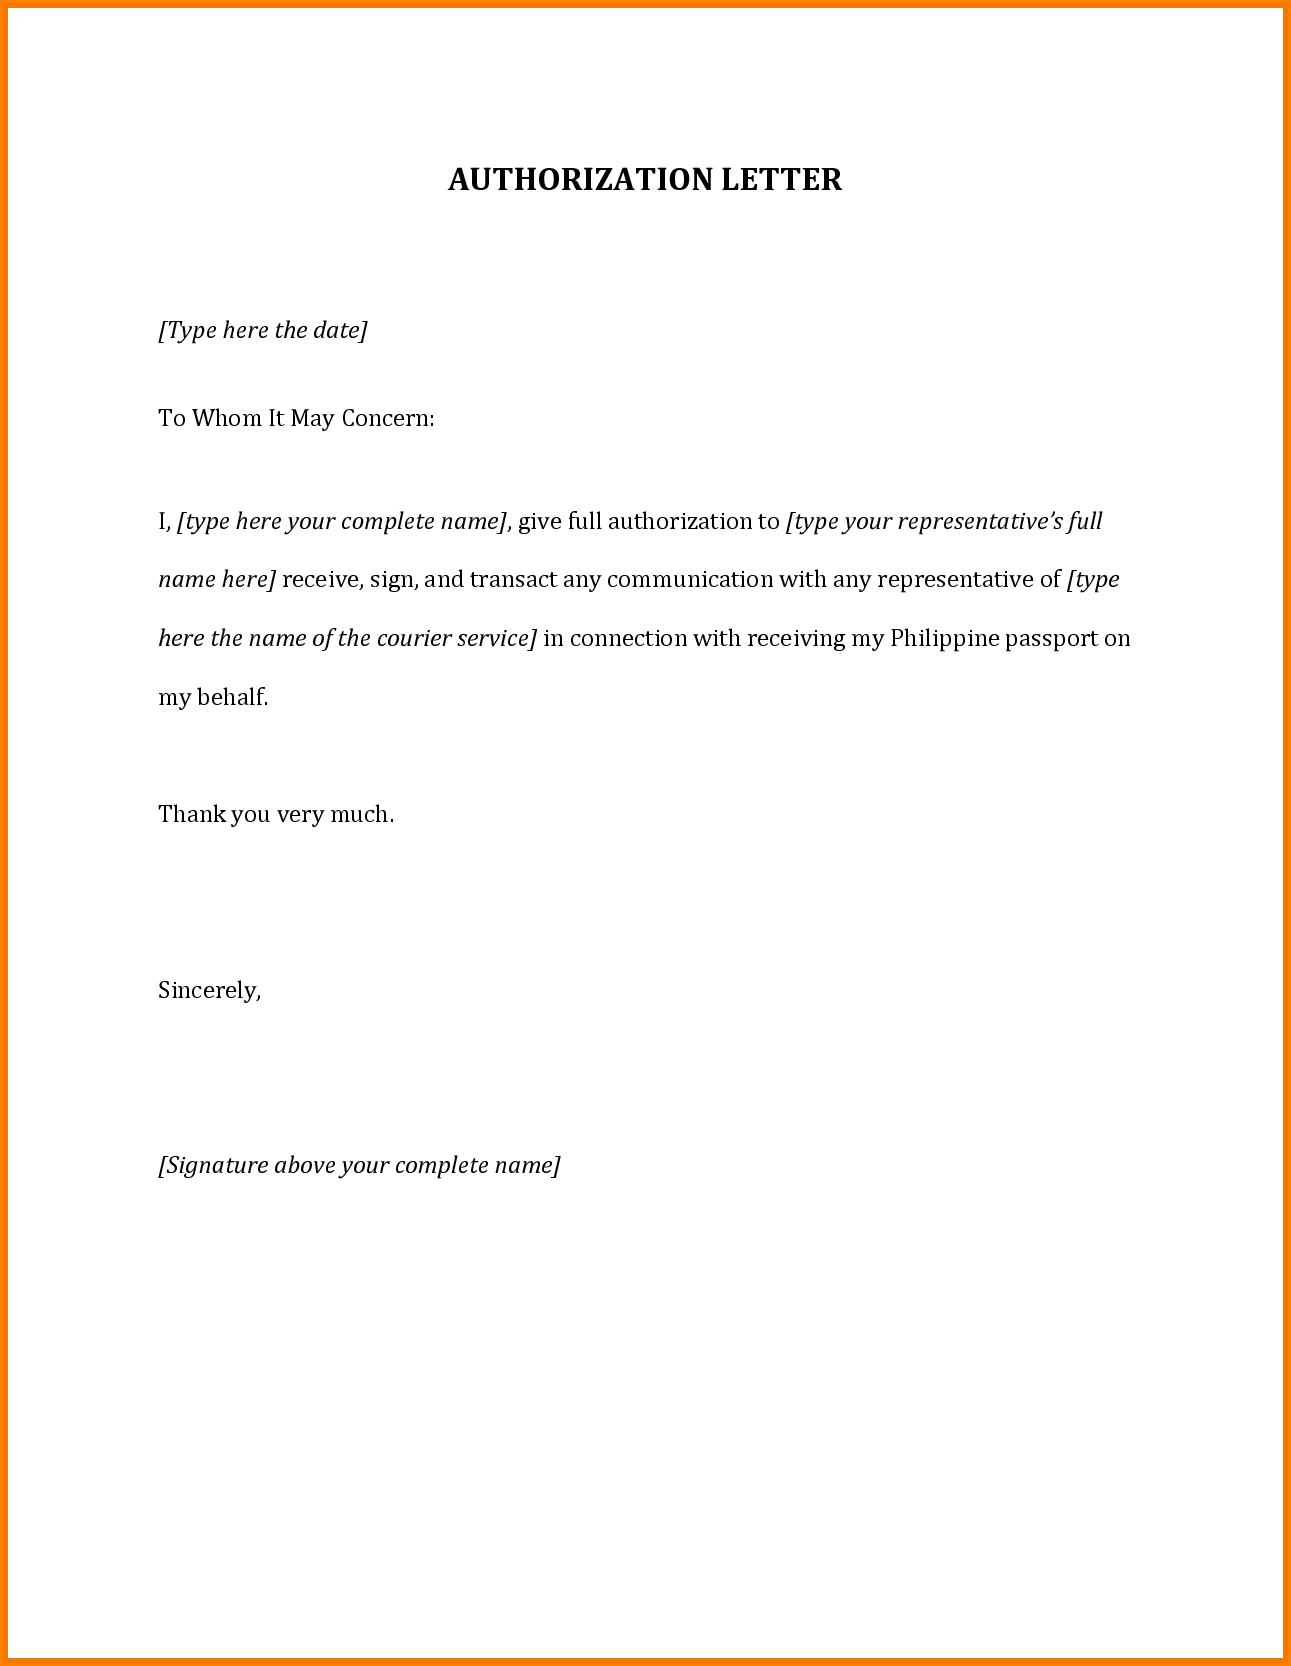 Authorization Letter For Passportmple Travel Home Design Idea